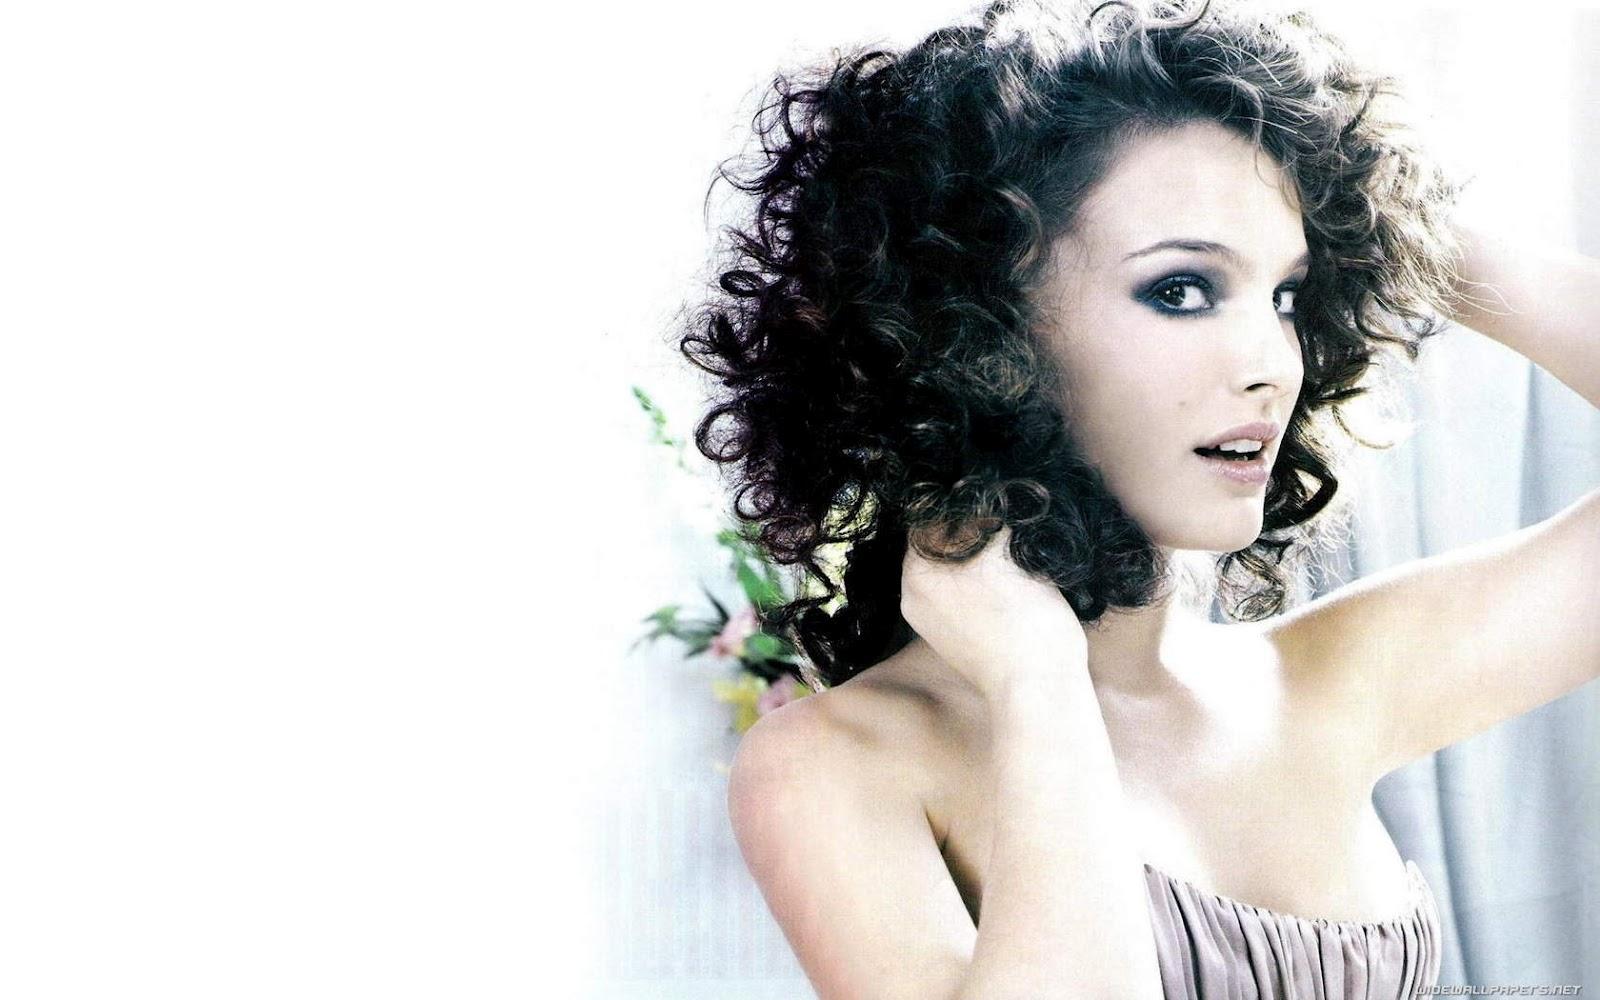 http://1.bp.blogspot.com/-3zFsSTJflTo/UEGT8vmHQFI/AAAAAAAAG6c/94JVAfg80F8/s1600/Natalie-Portman-Curly-Hair.jpg